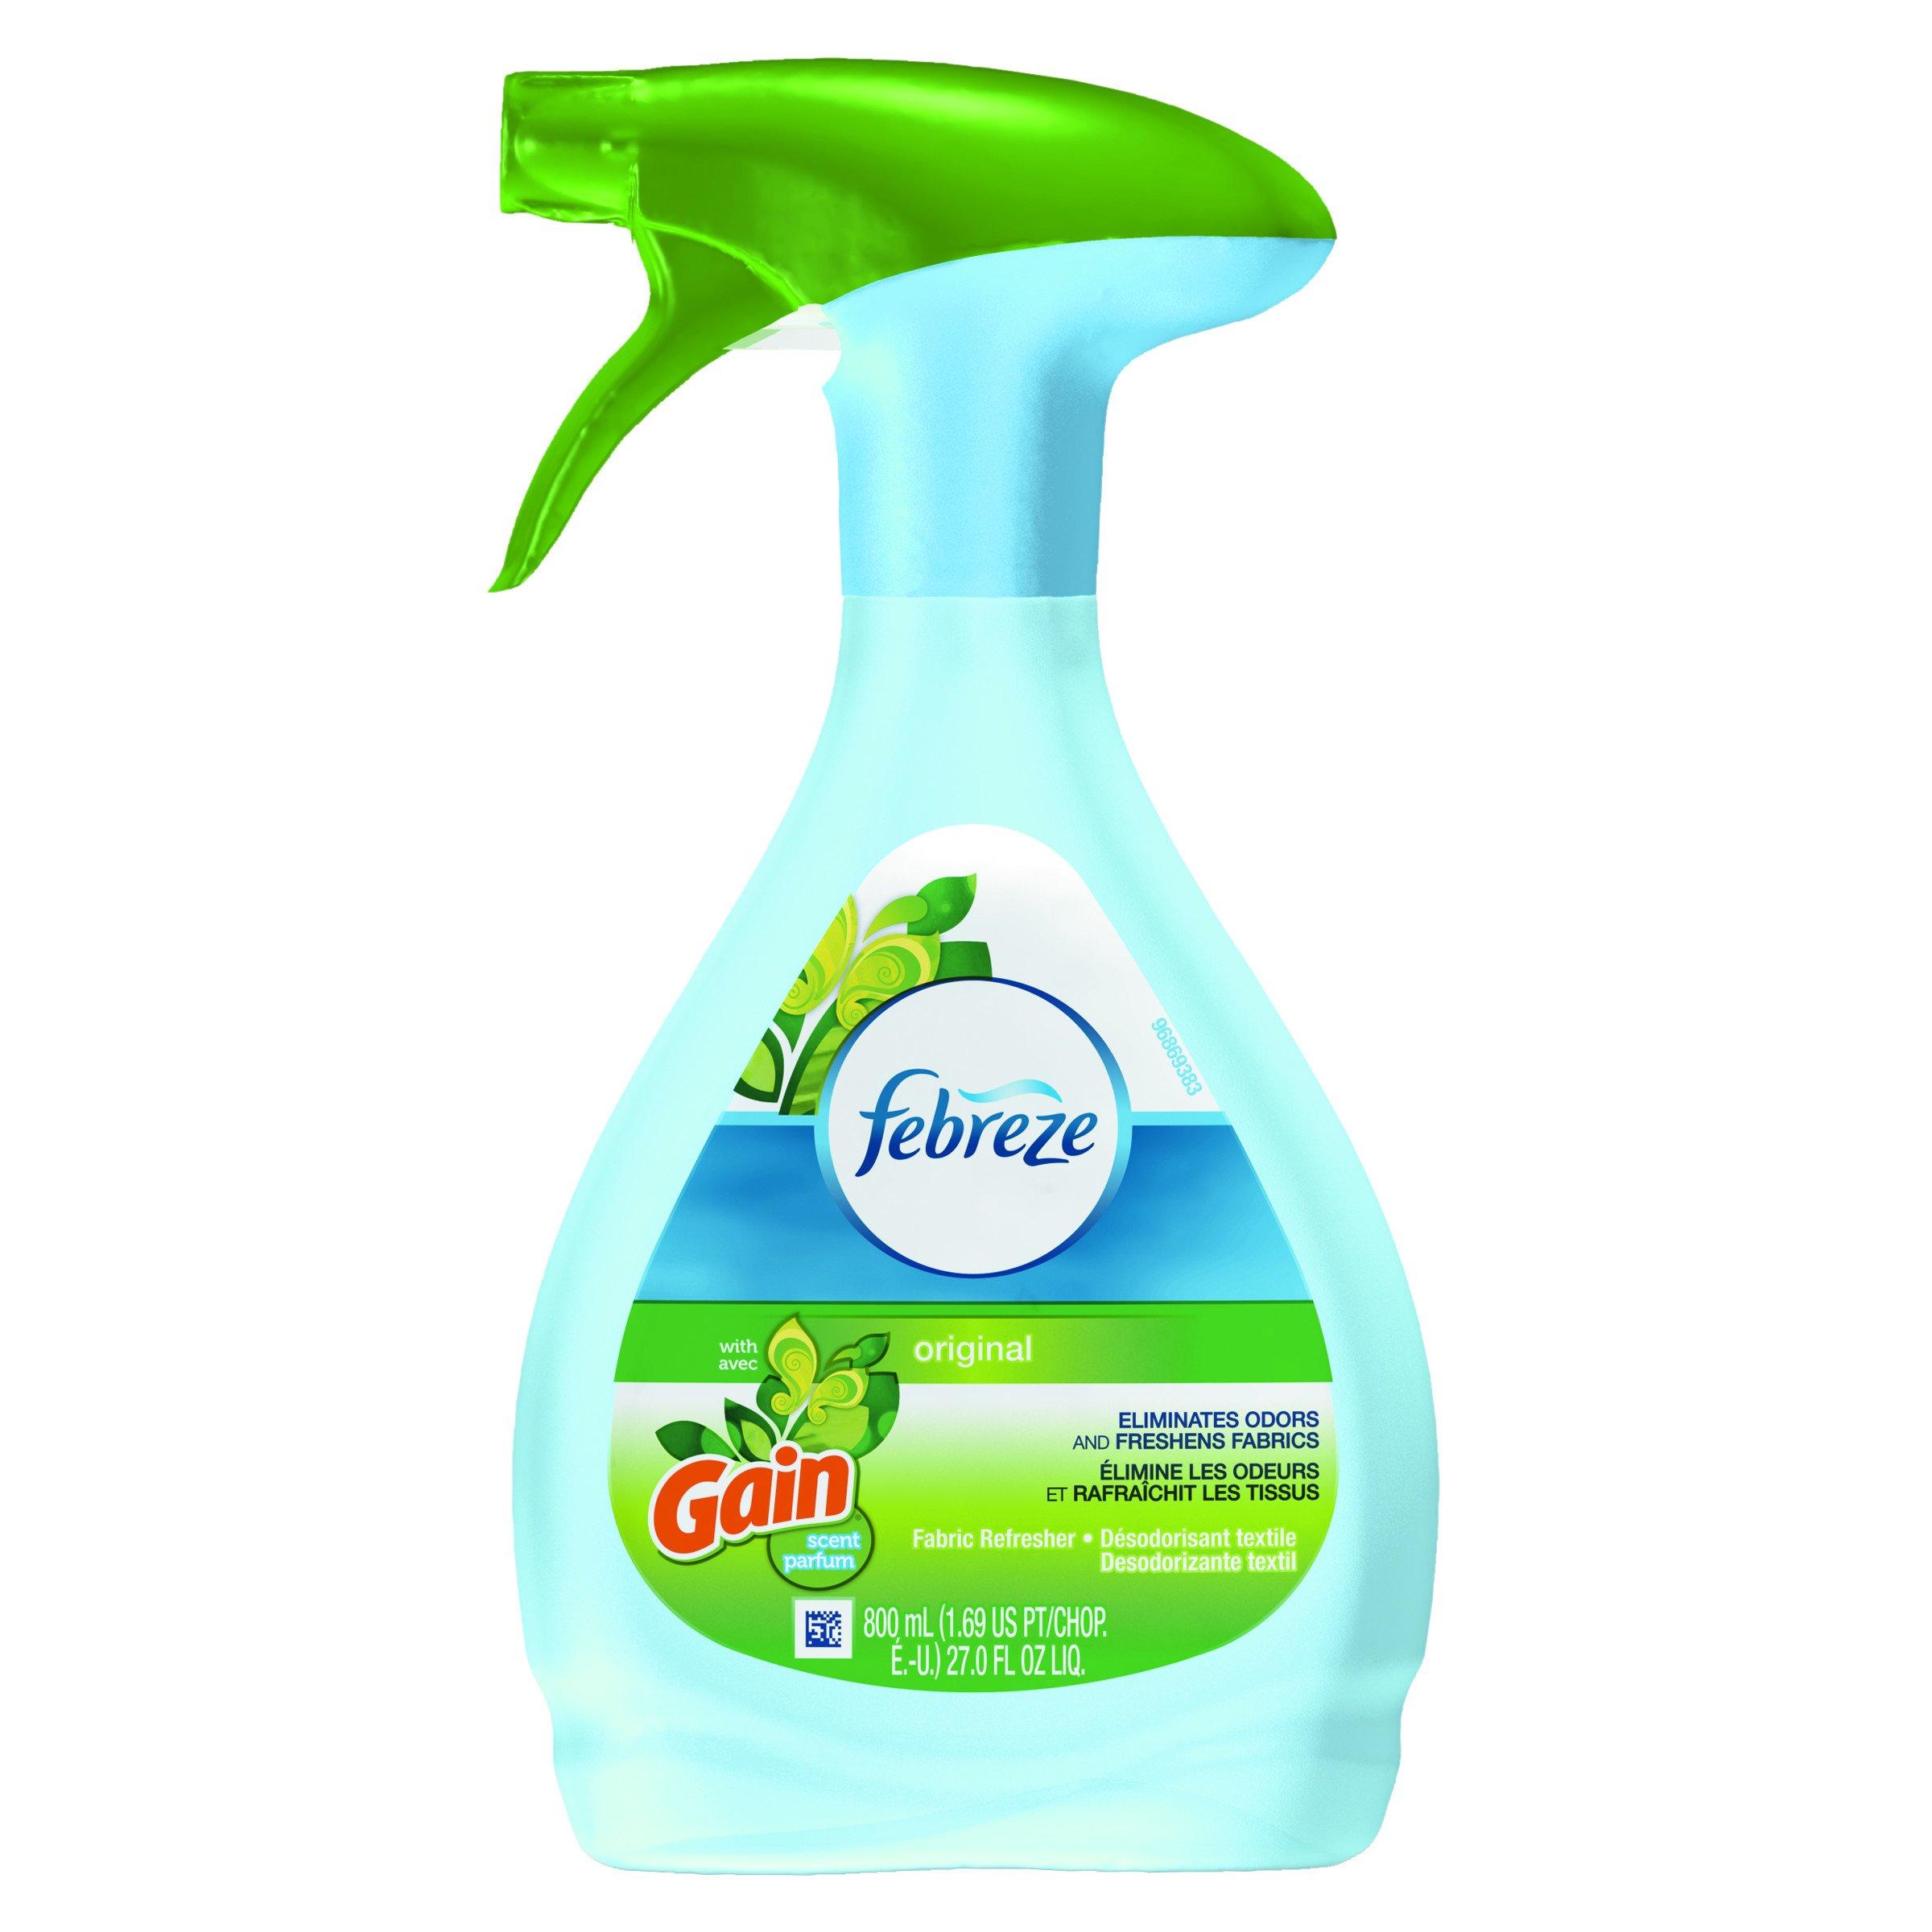 Febreze 47804CT Fabric Refresher & Odor Eliminator, Gain Original, 27 oz Spray Bottle (Case of 6) by Febreze